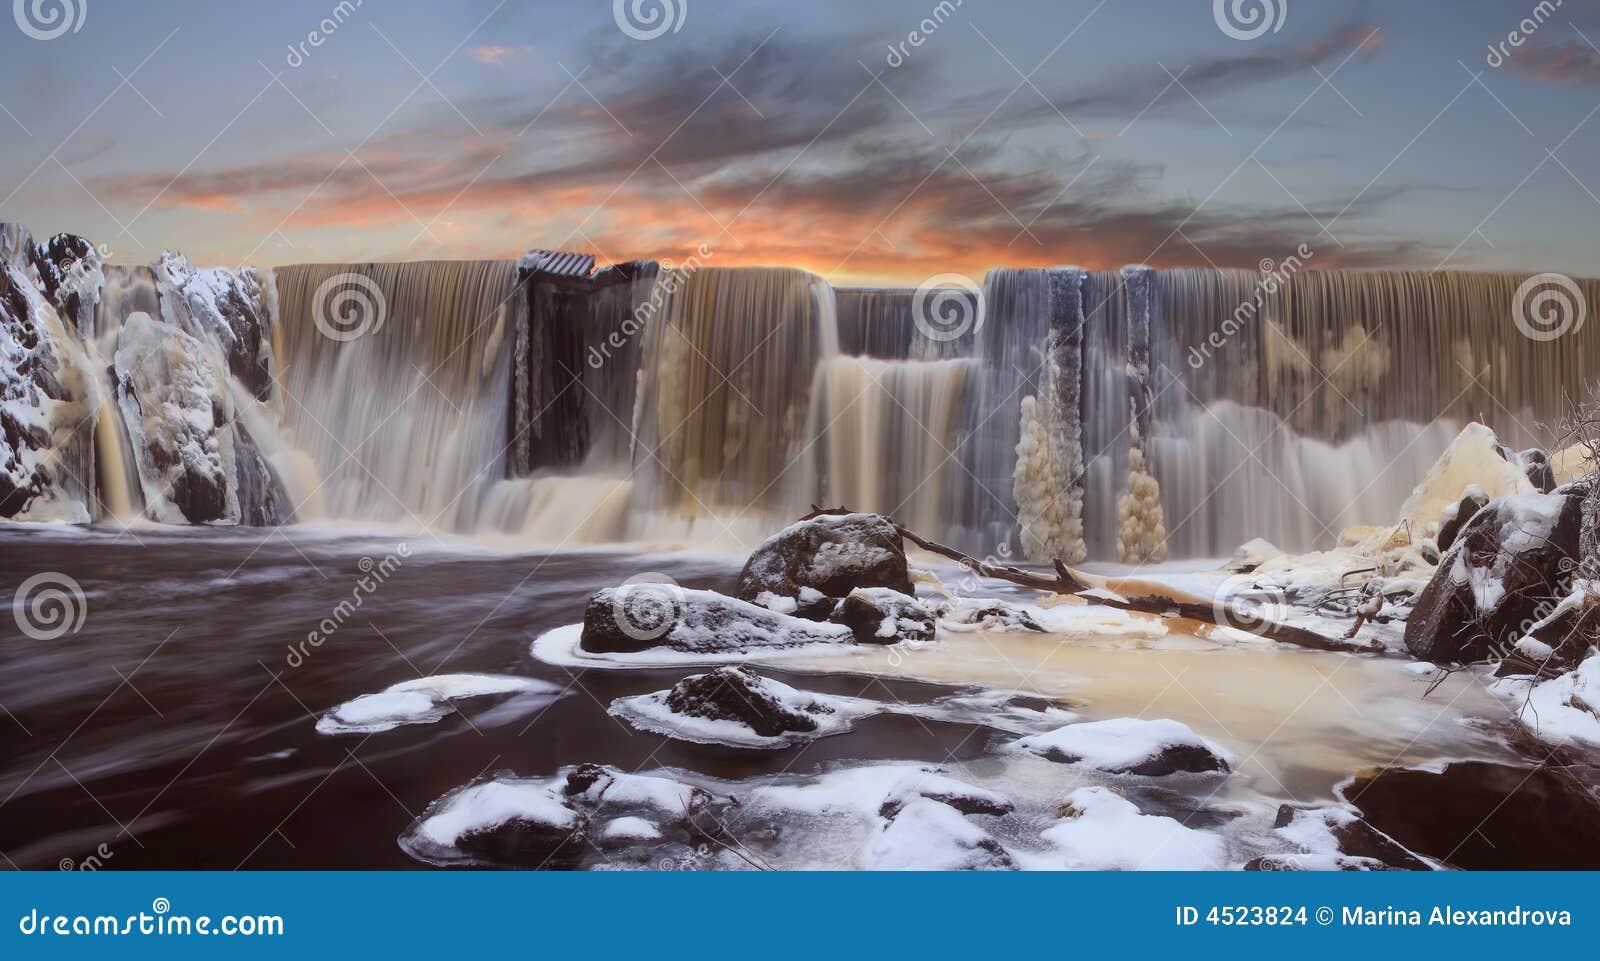 Winter falls on a sunset